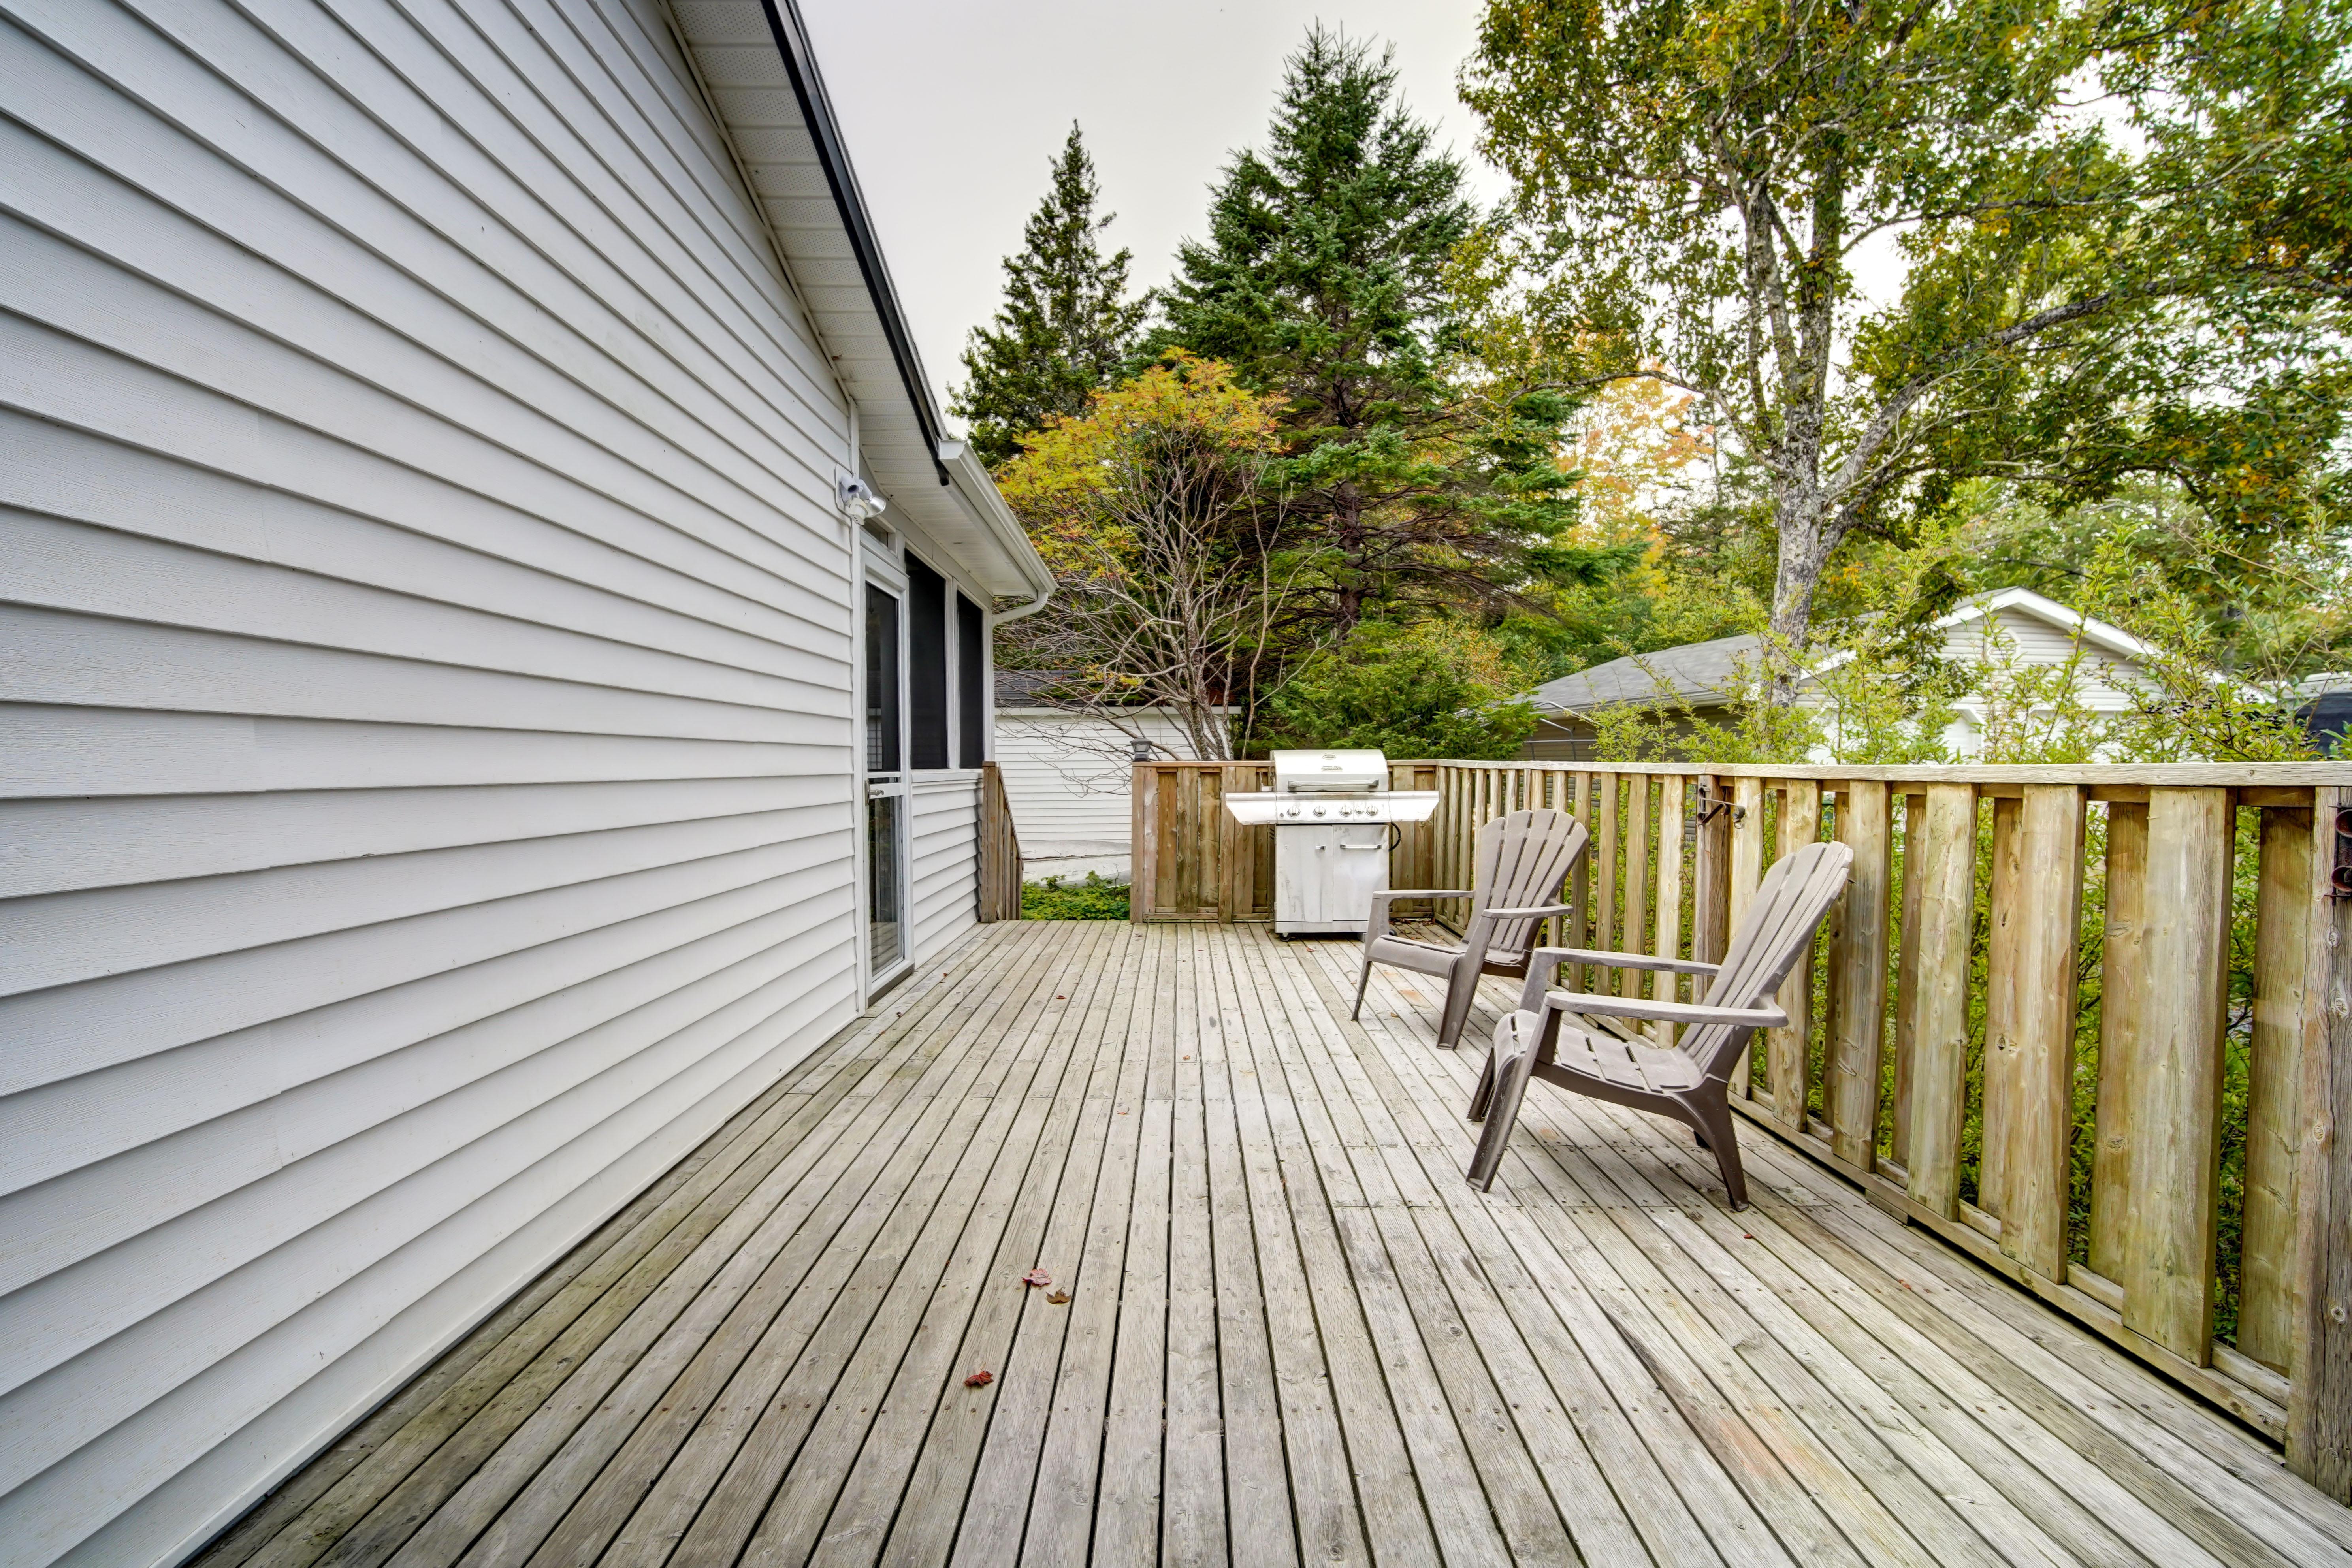 Good-sized deck